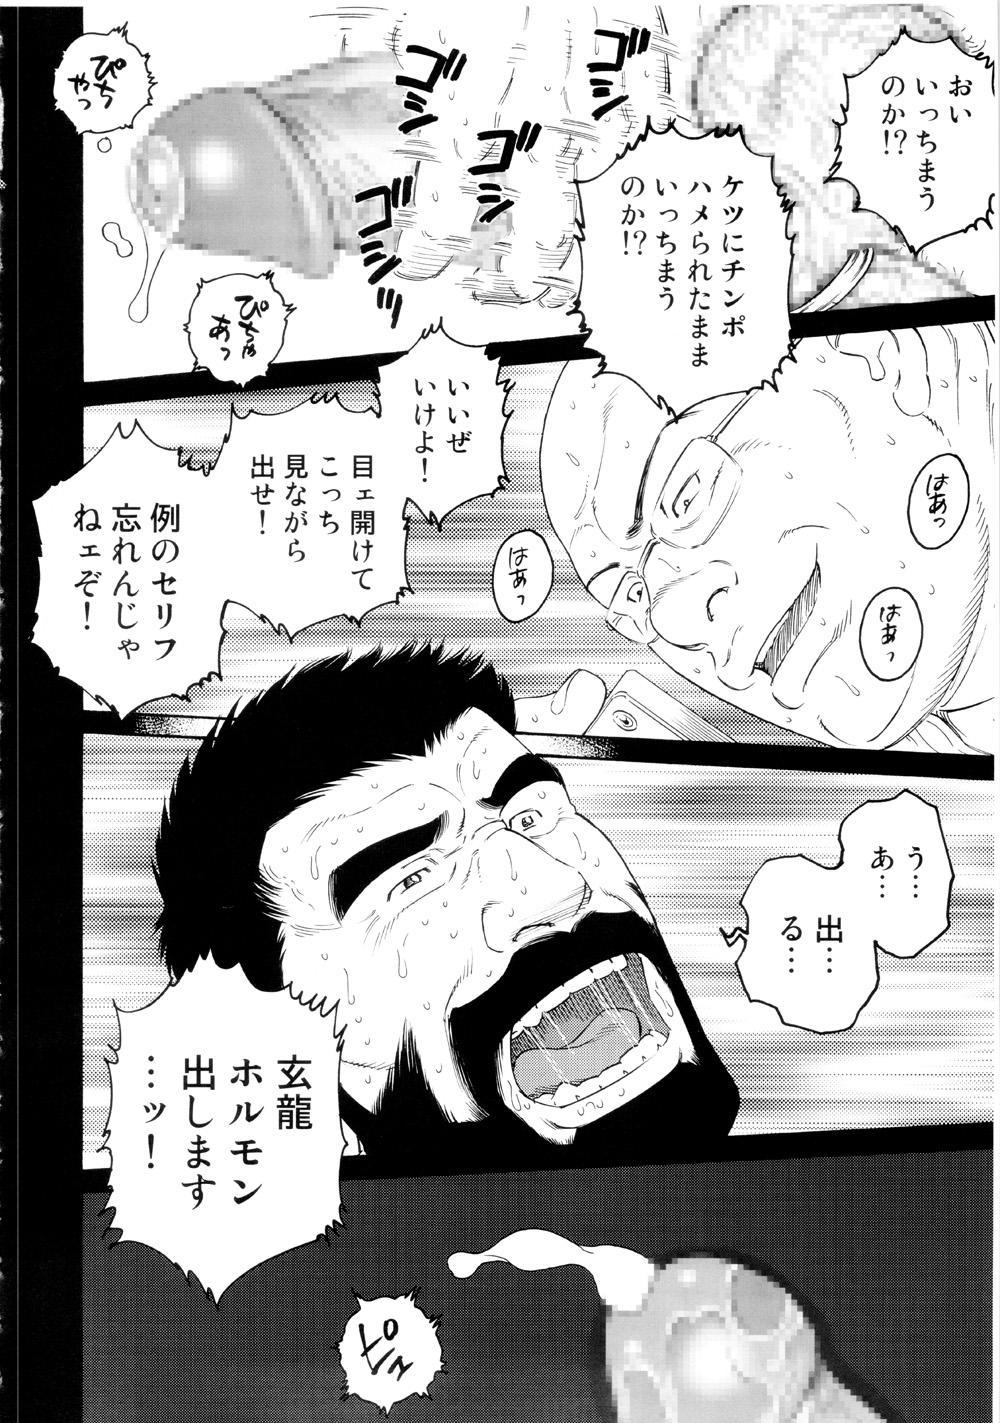 Genryu Chapter 2 9